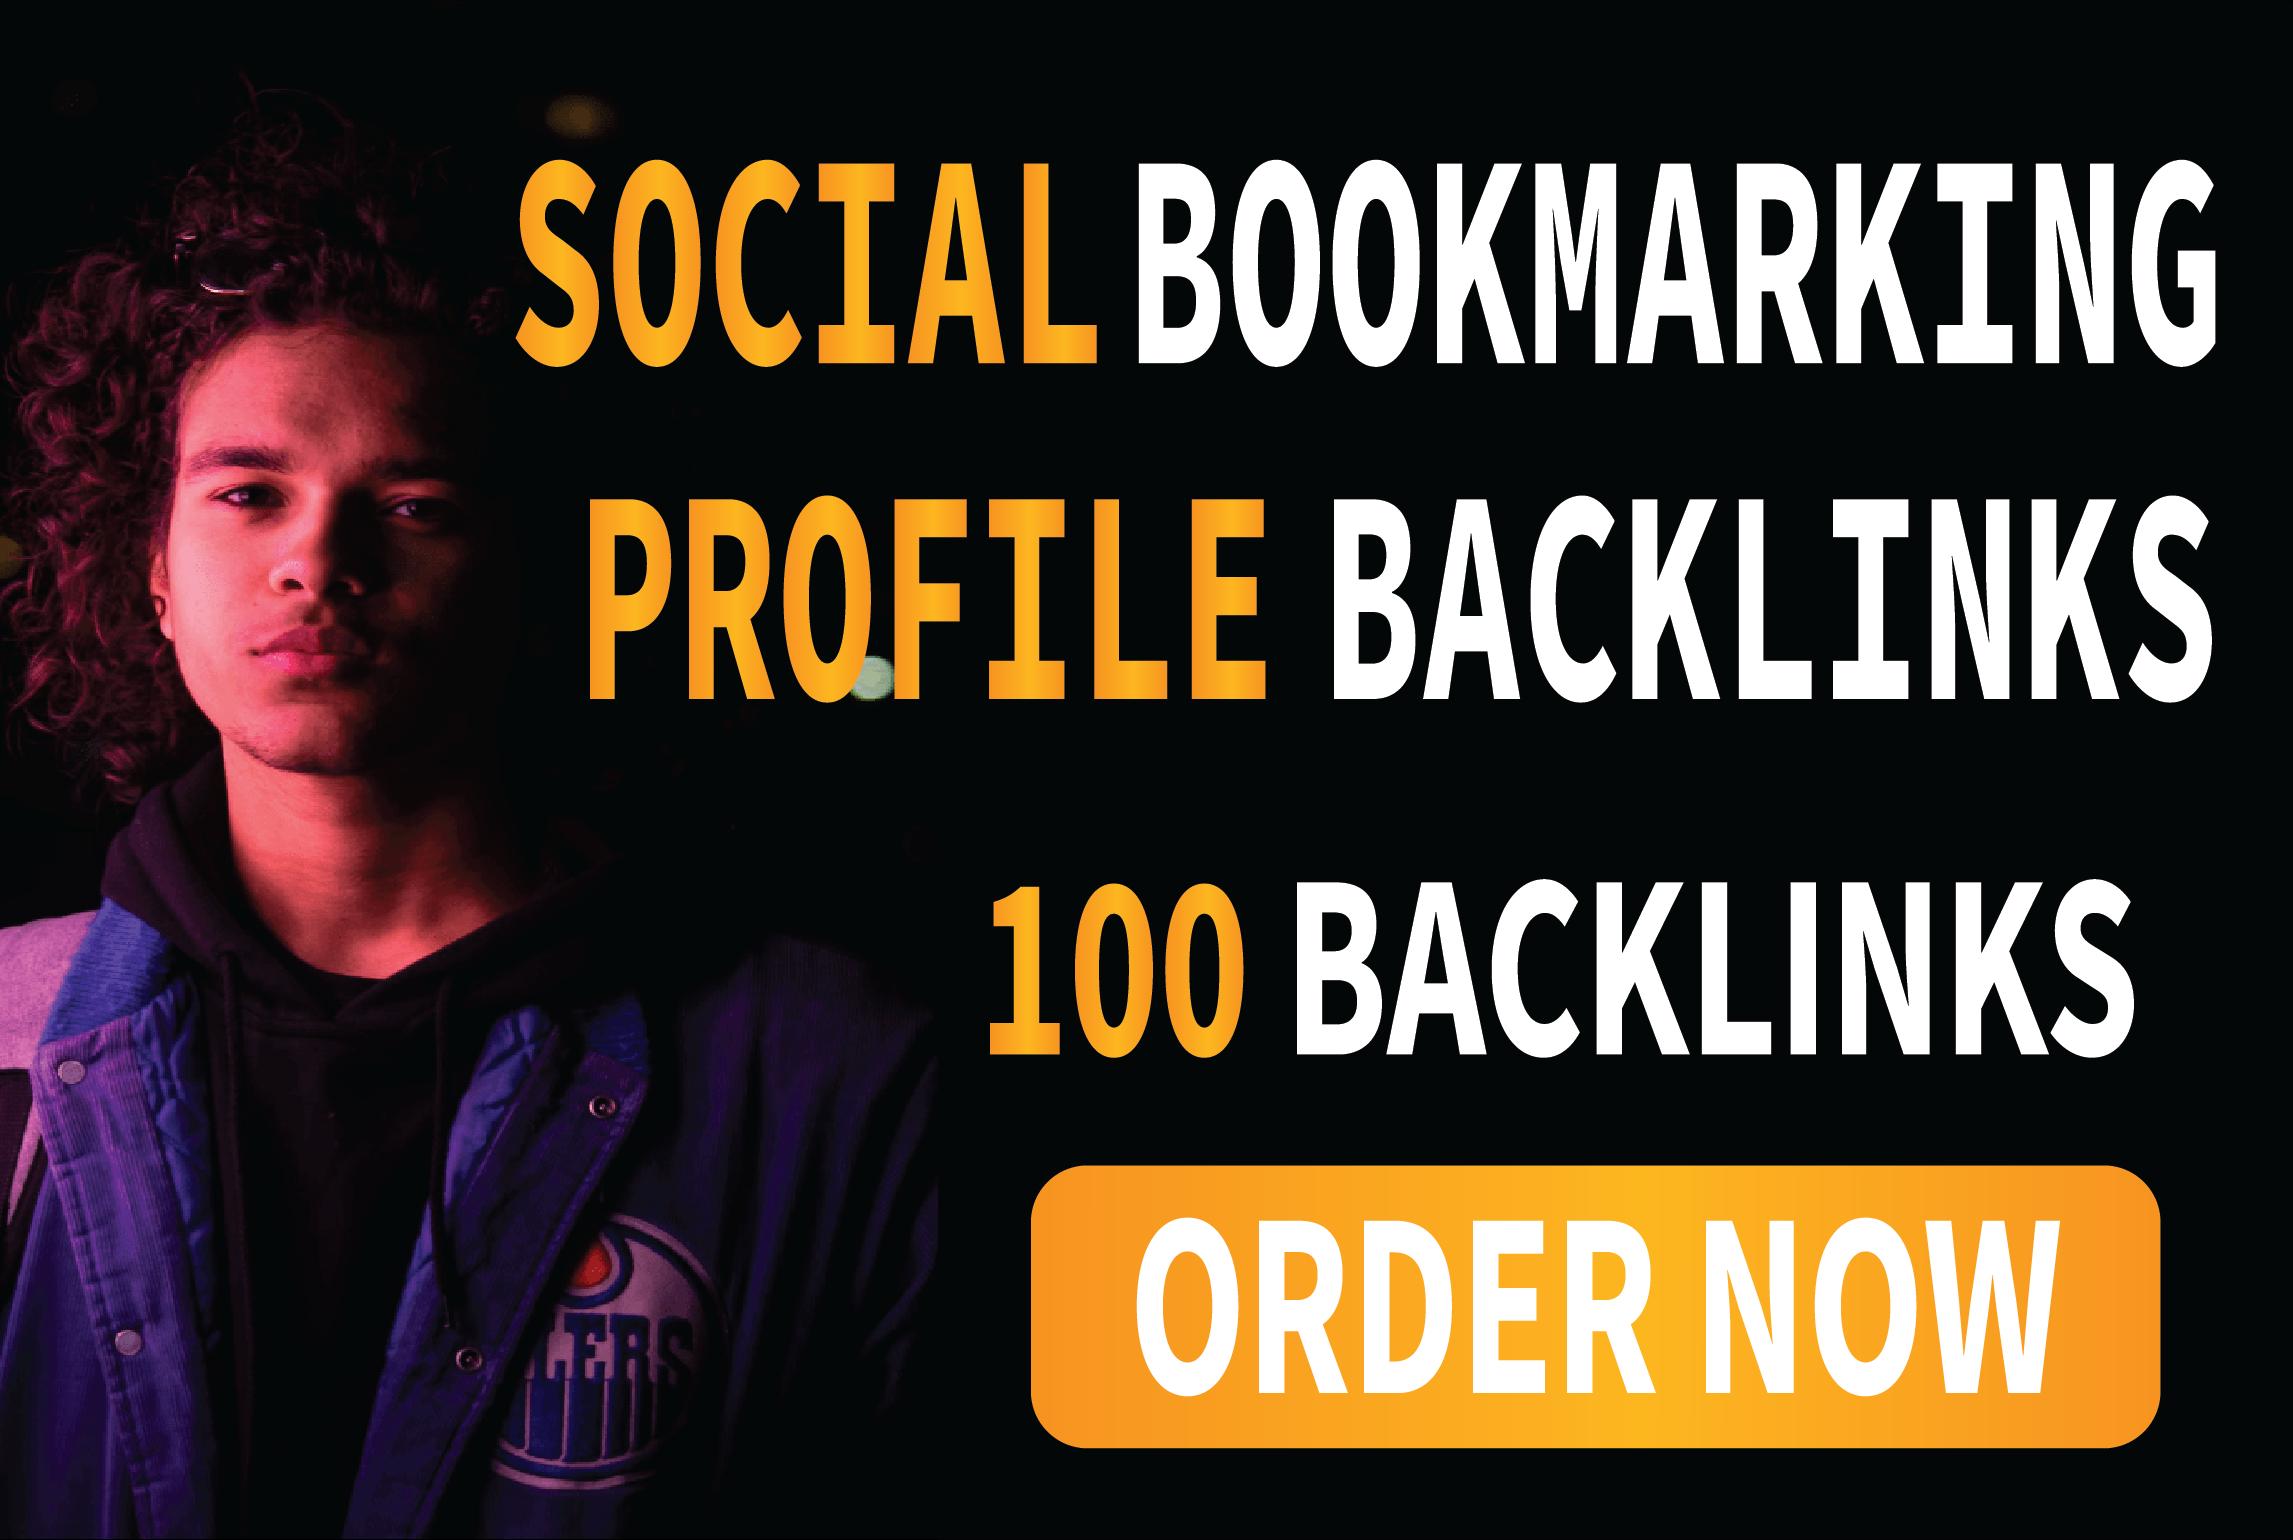 I will do 100 social bookmarking SEO profile backlinks